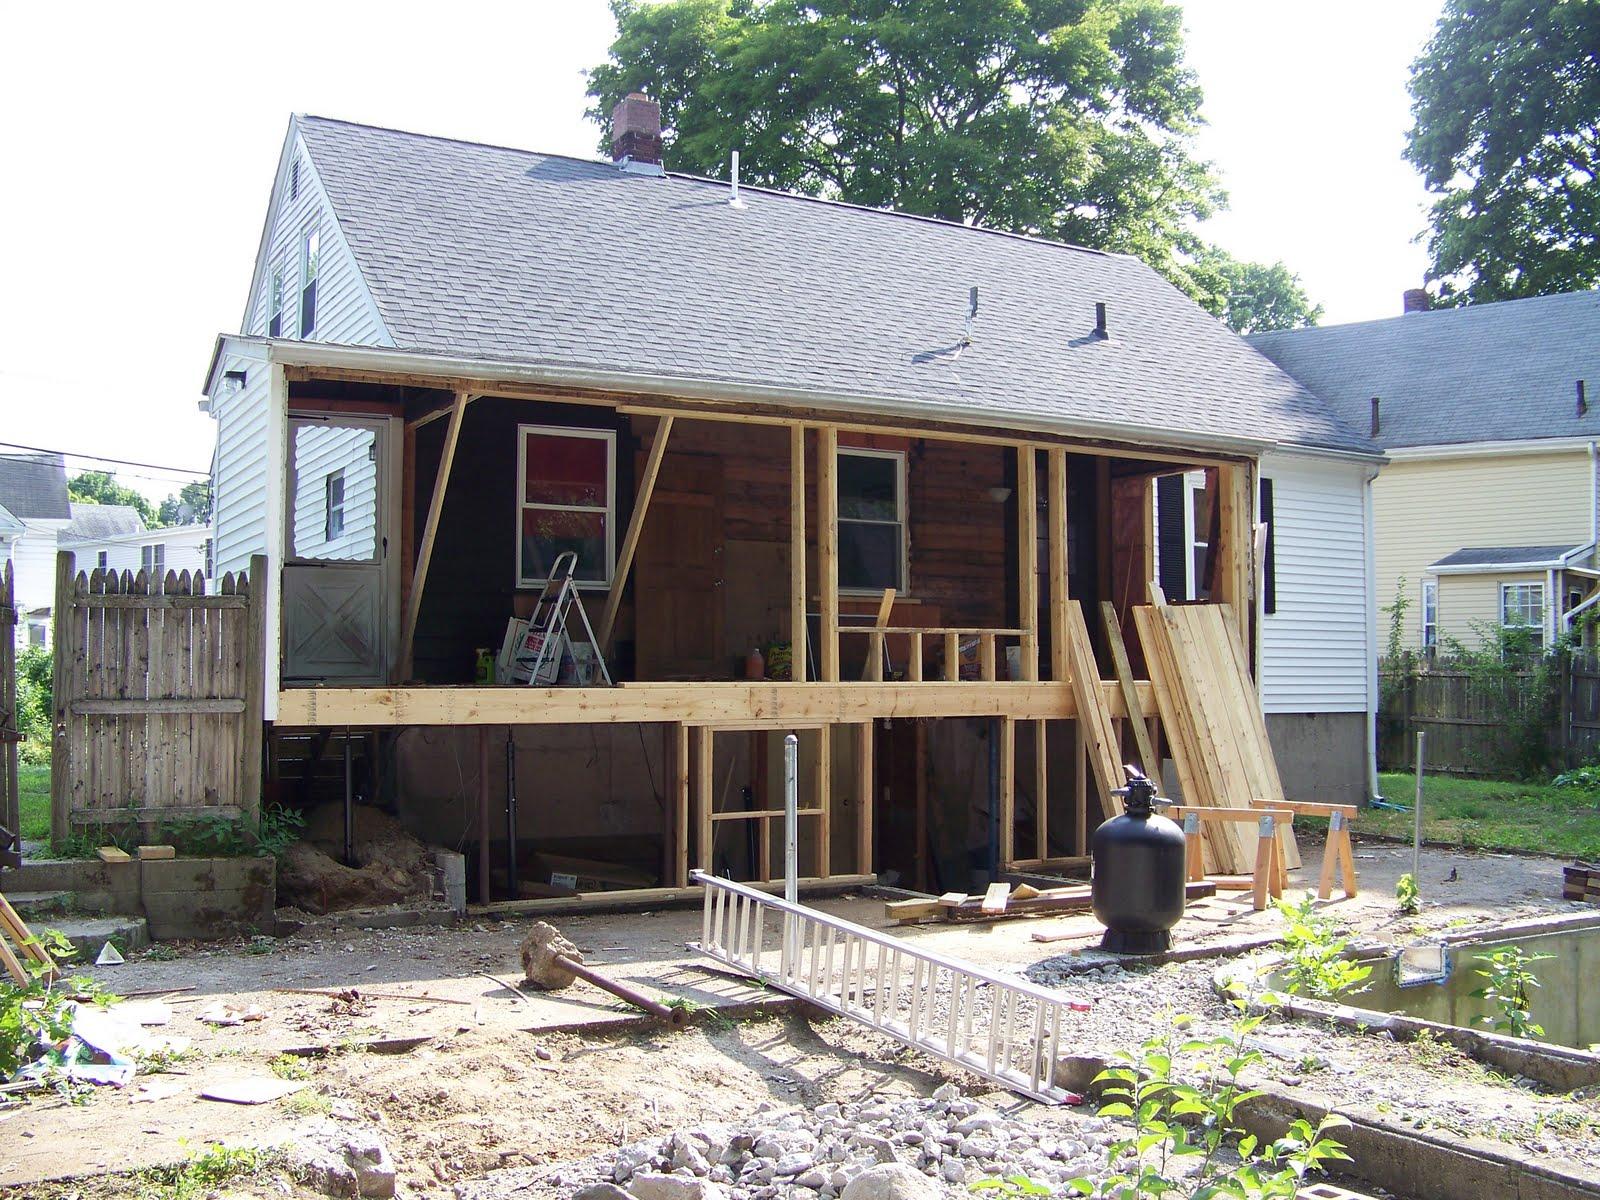 126 Emory Street Renovations 4 Season Porch